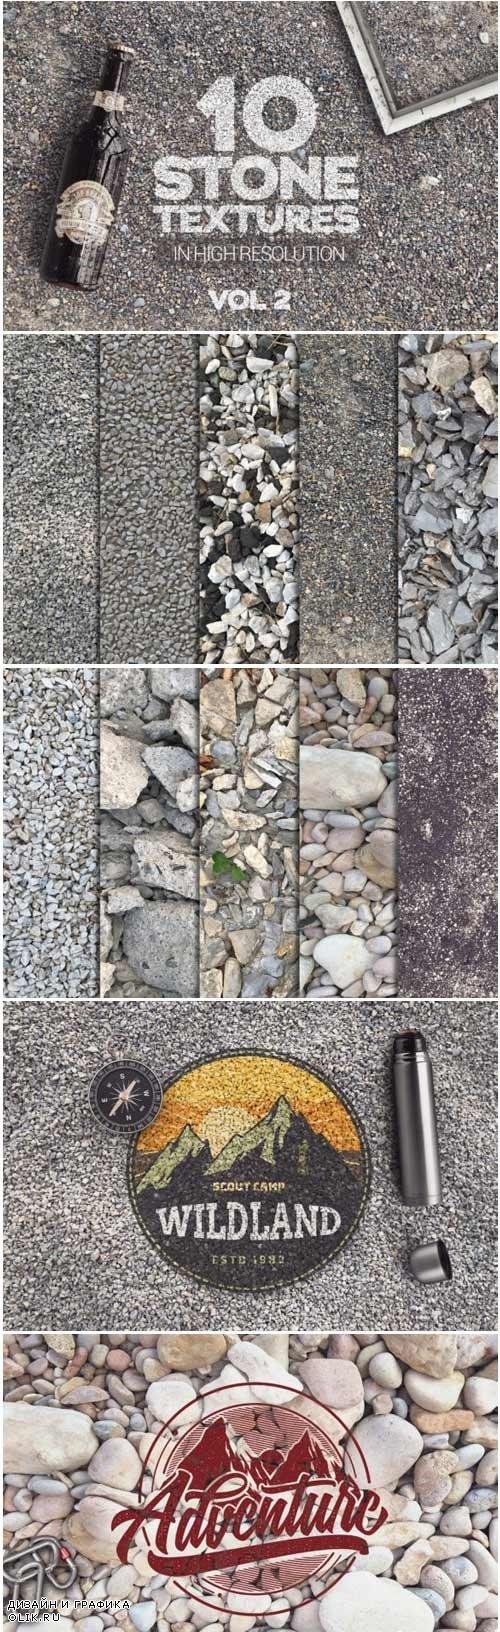 Stone Textures Vol 2 x10 3976556